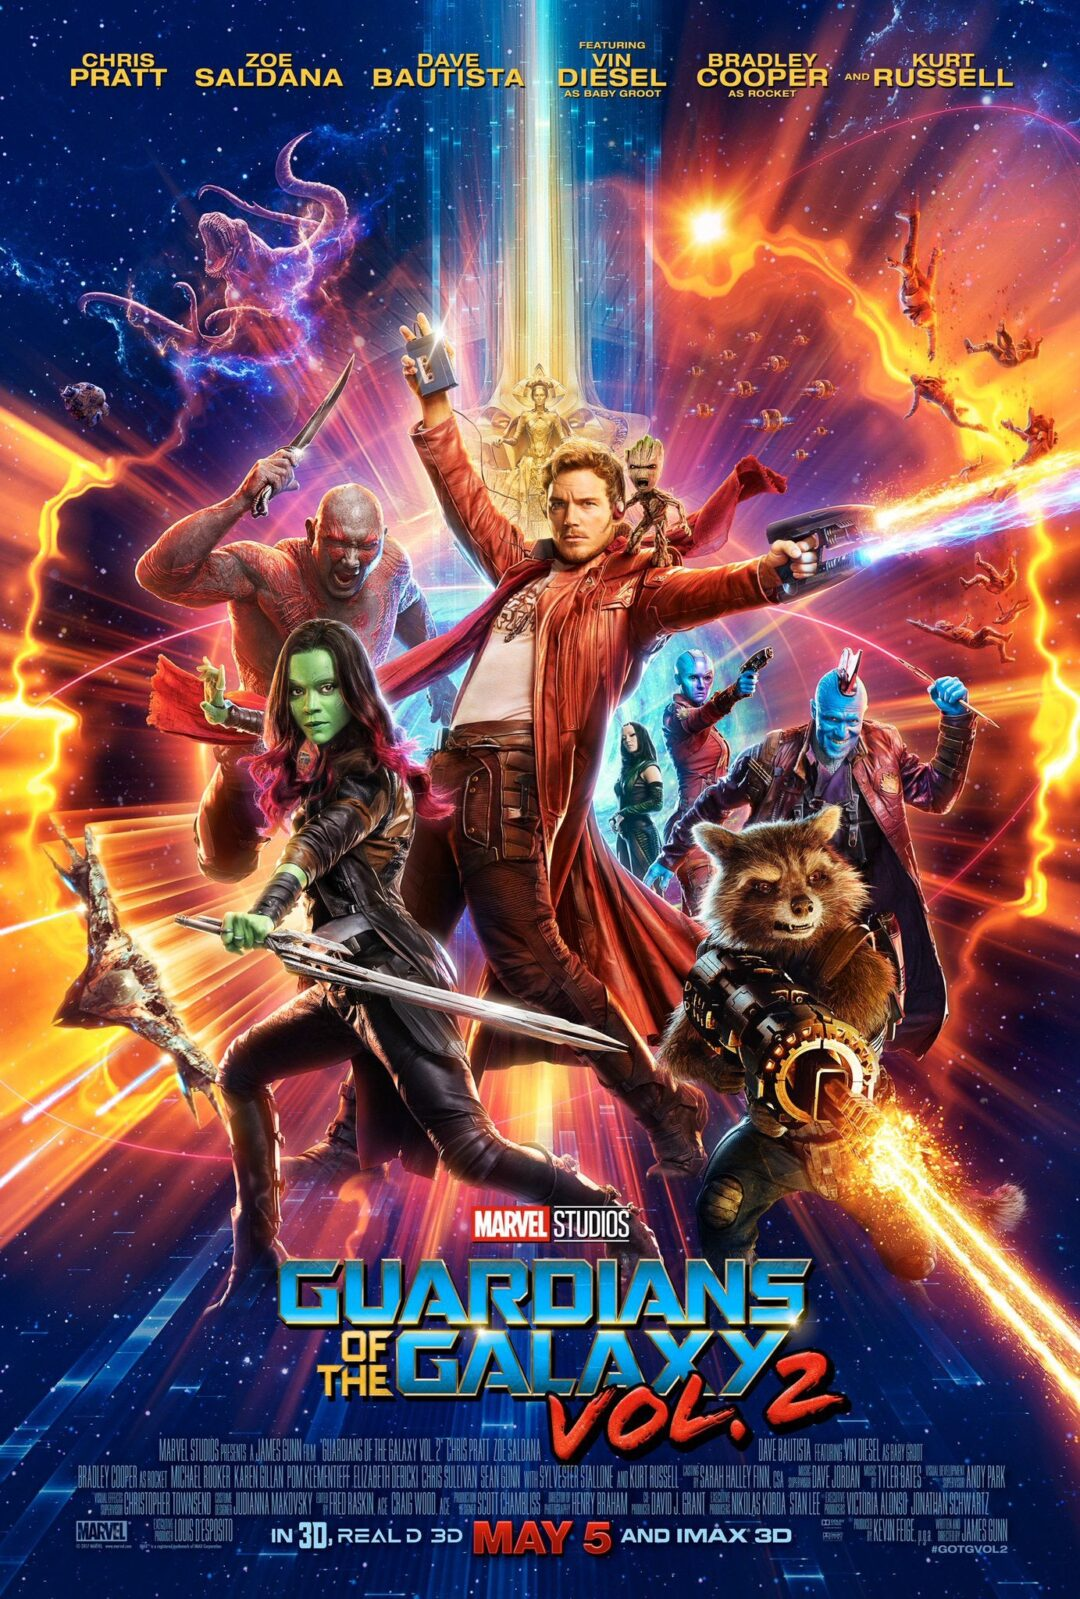 guardians of the galaxy vol 2 marvel marathon order